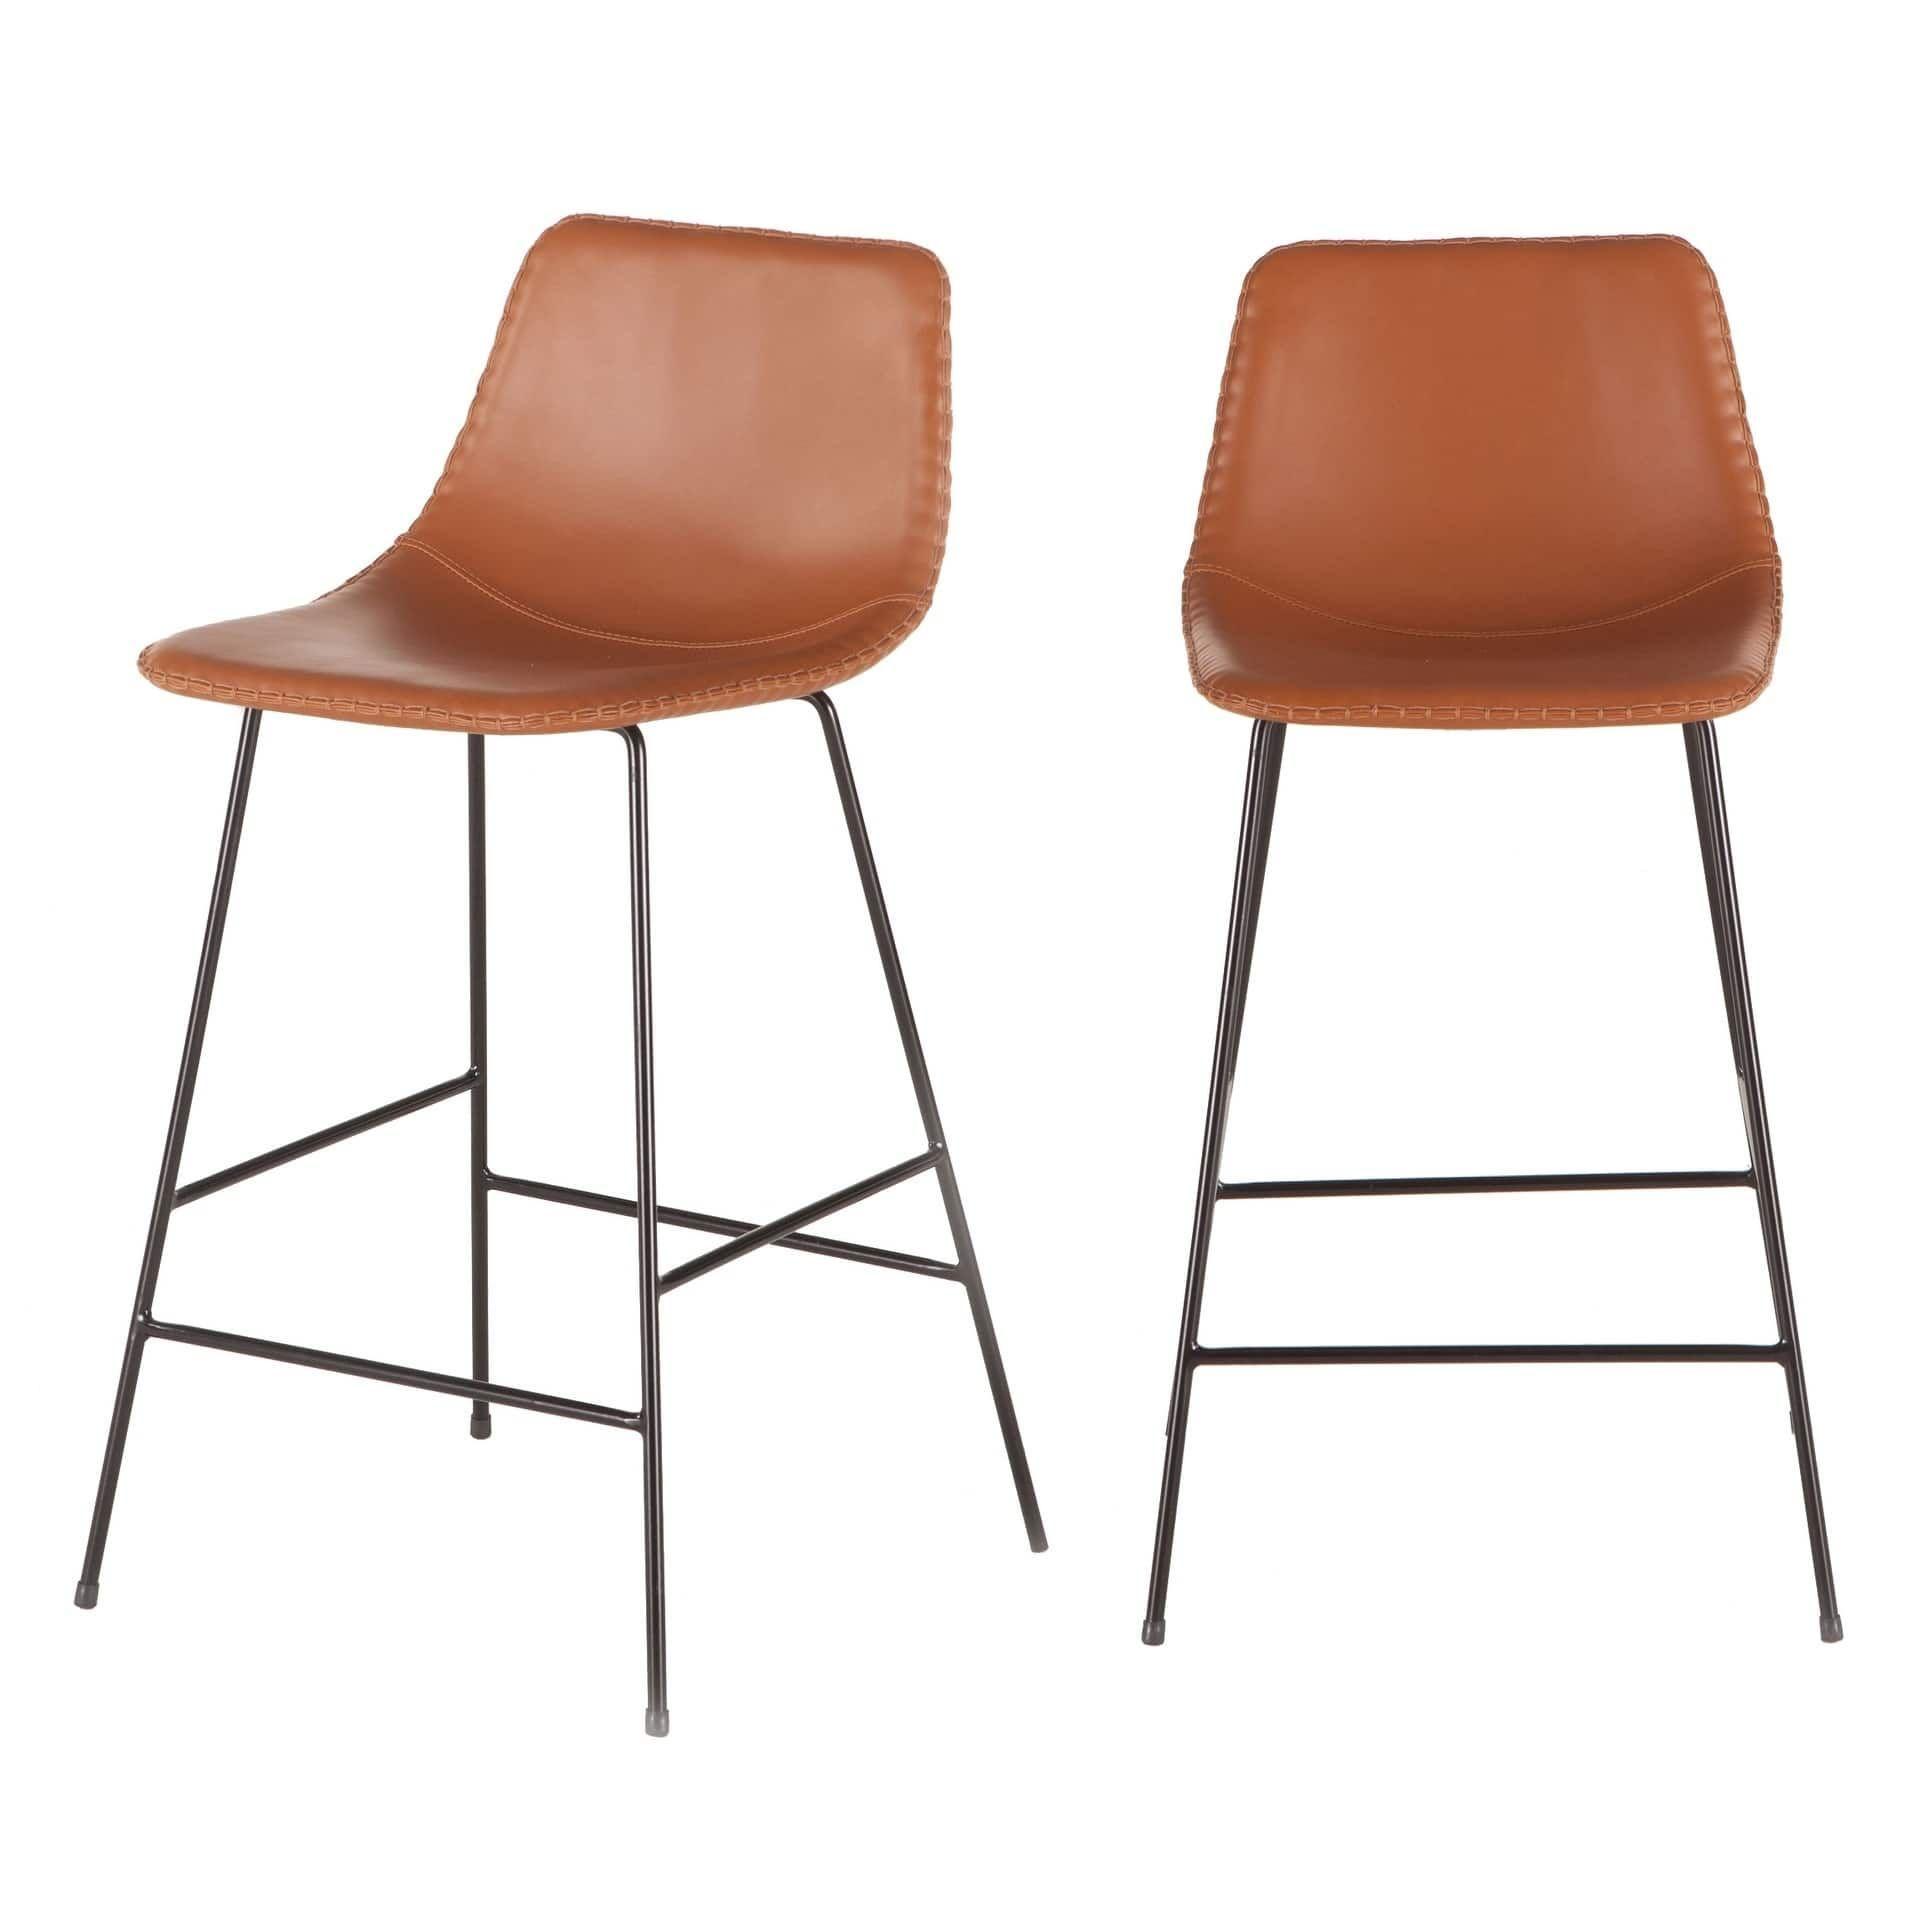 Remarkable Tan Faux Leather Counter Height Stool By World Interiors Inzonedesignstudio Interior Chair Design Inzonedesignstudiocom